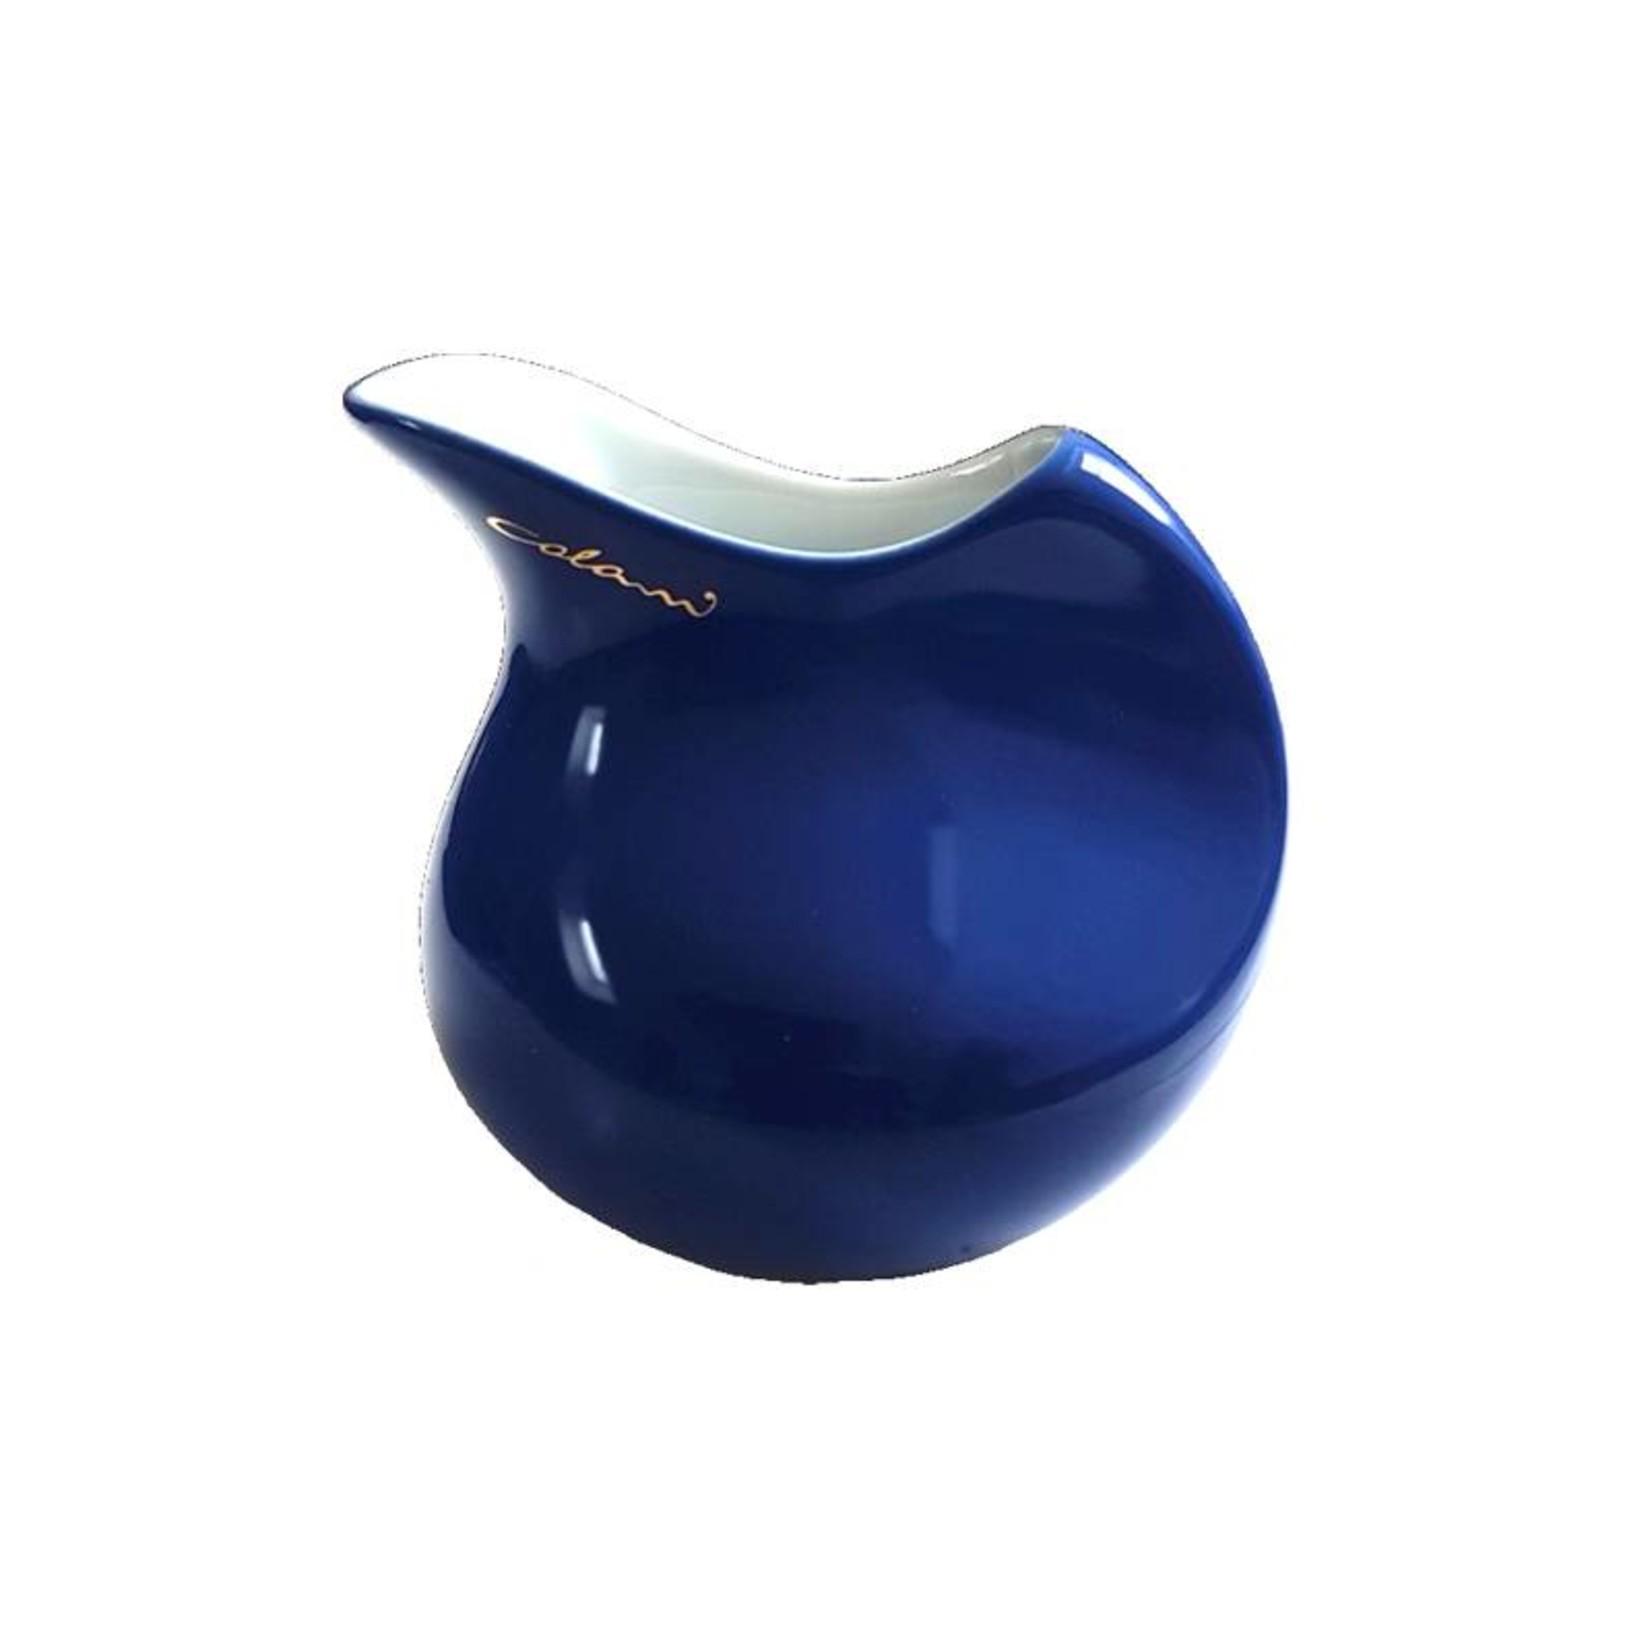 Colani Porzellanserie Colani Sahnegießer I blau I Milchkännchen I Porzellan